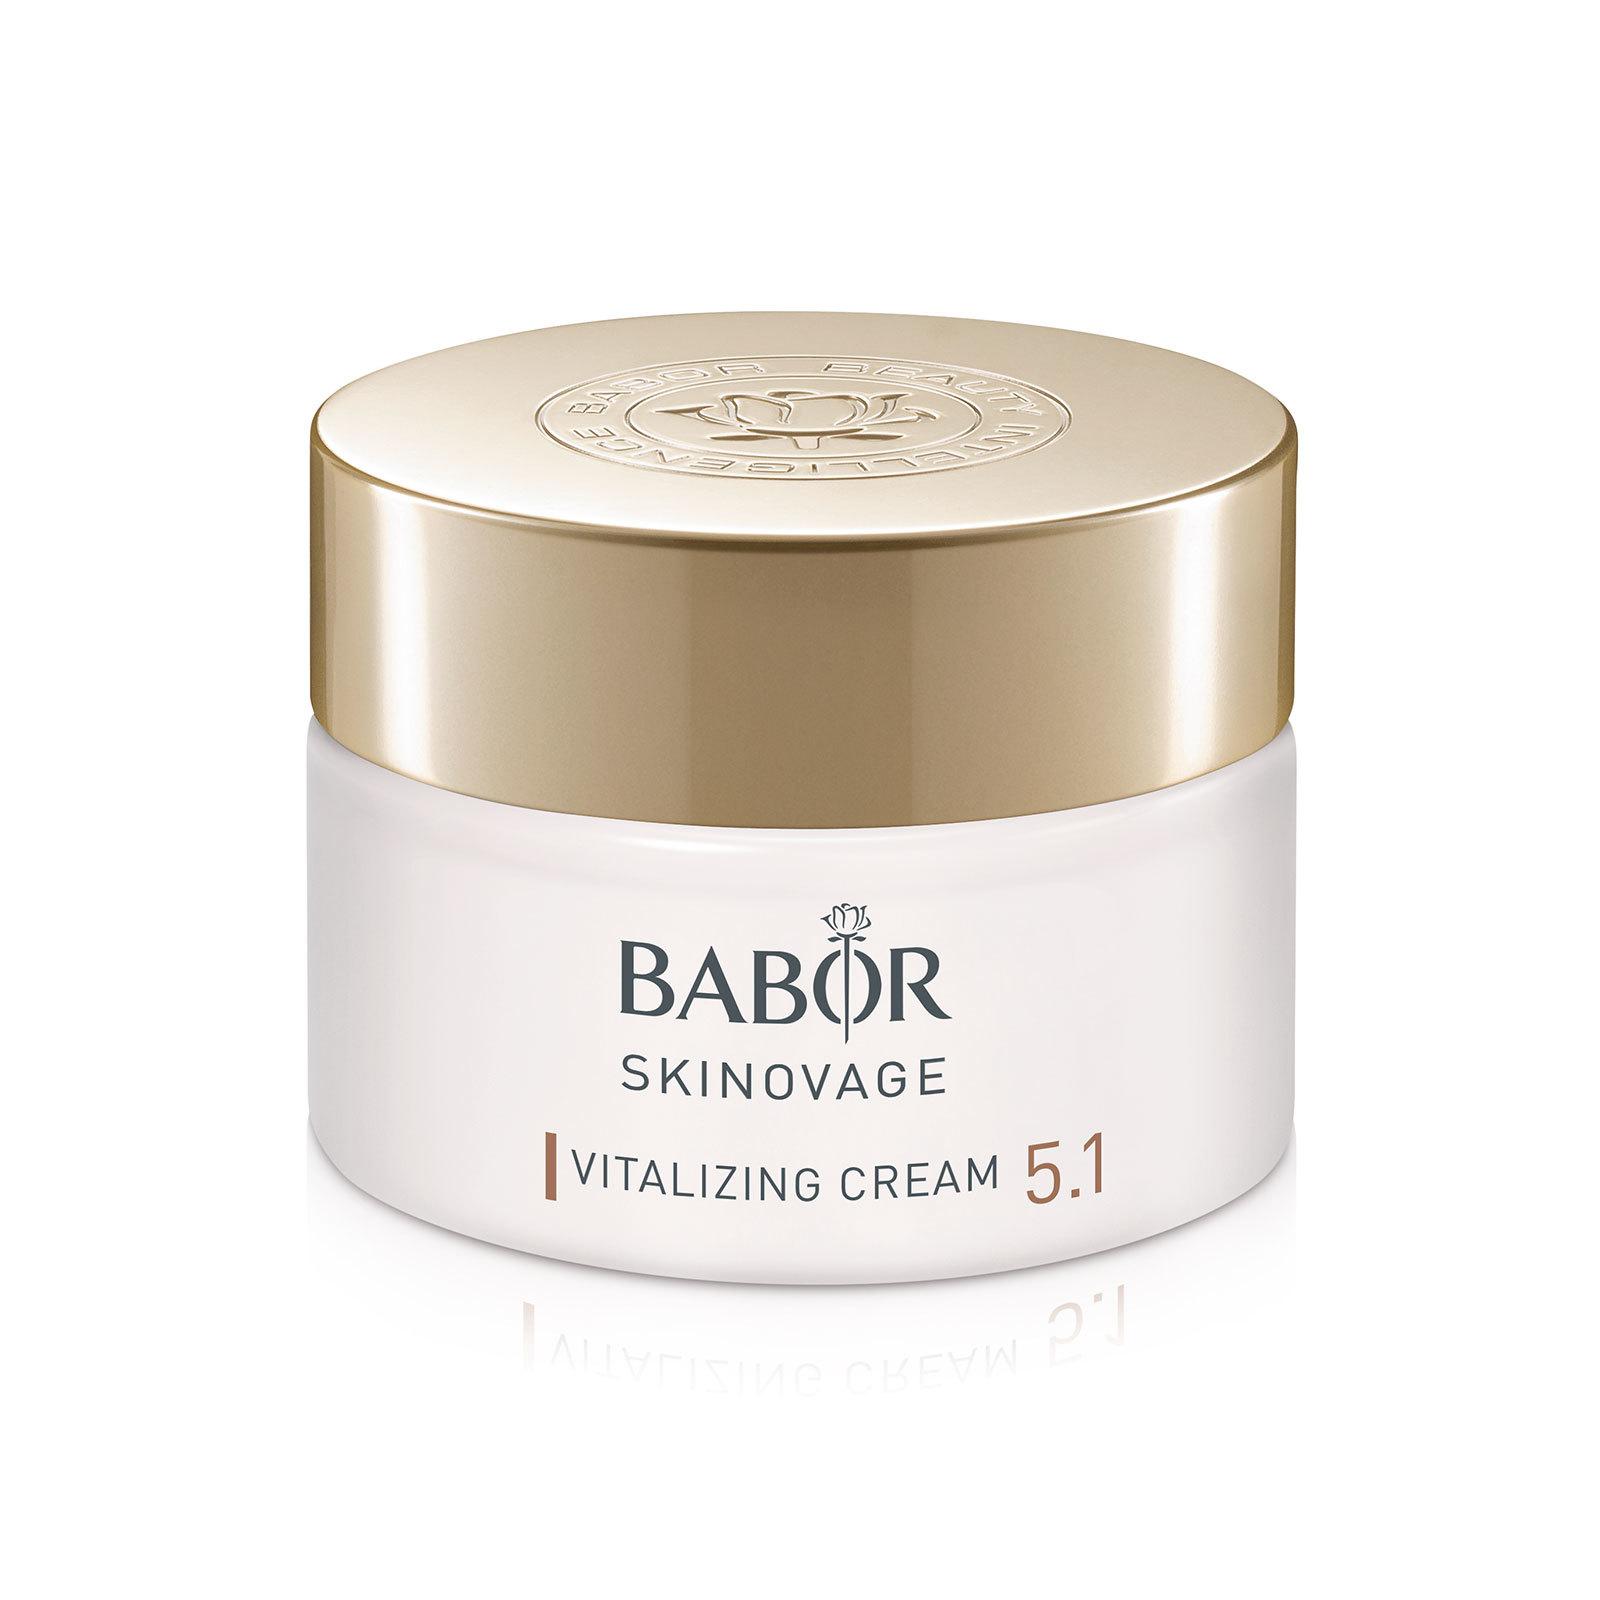 Крем Babor Skinovage Vitalizing Cream 5.1 50ml